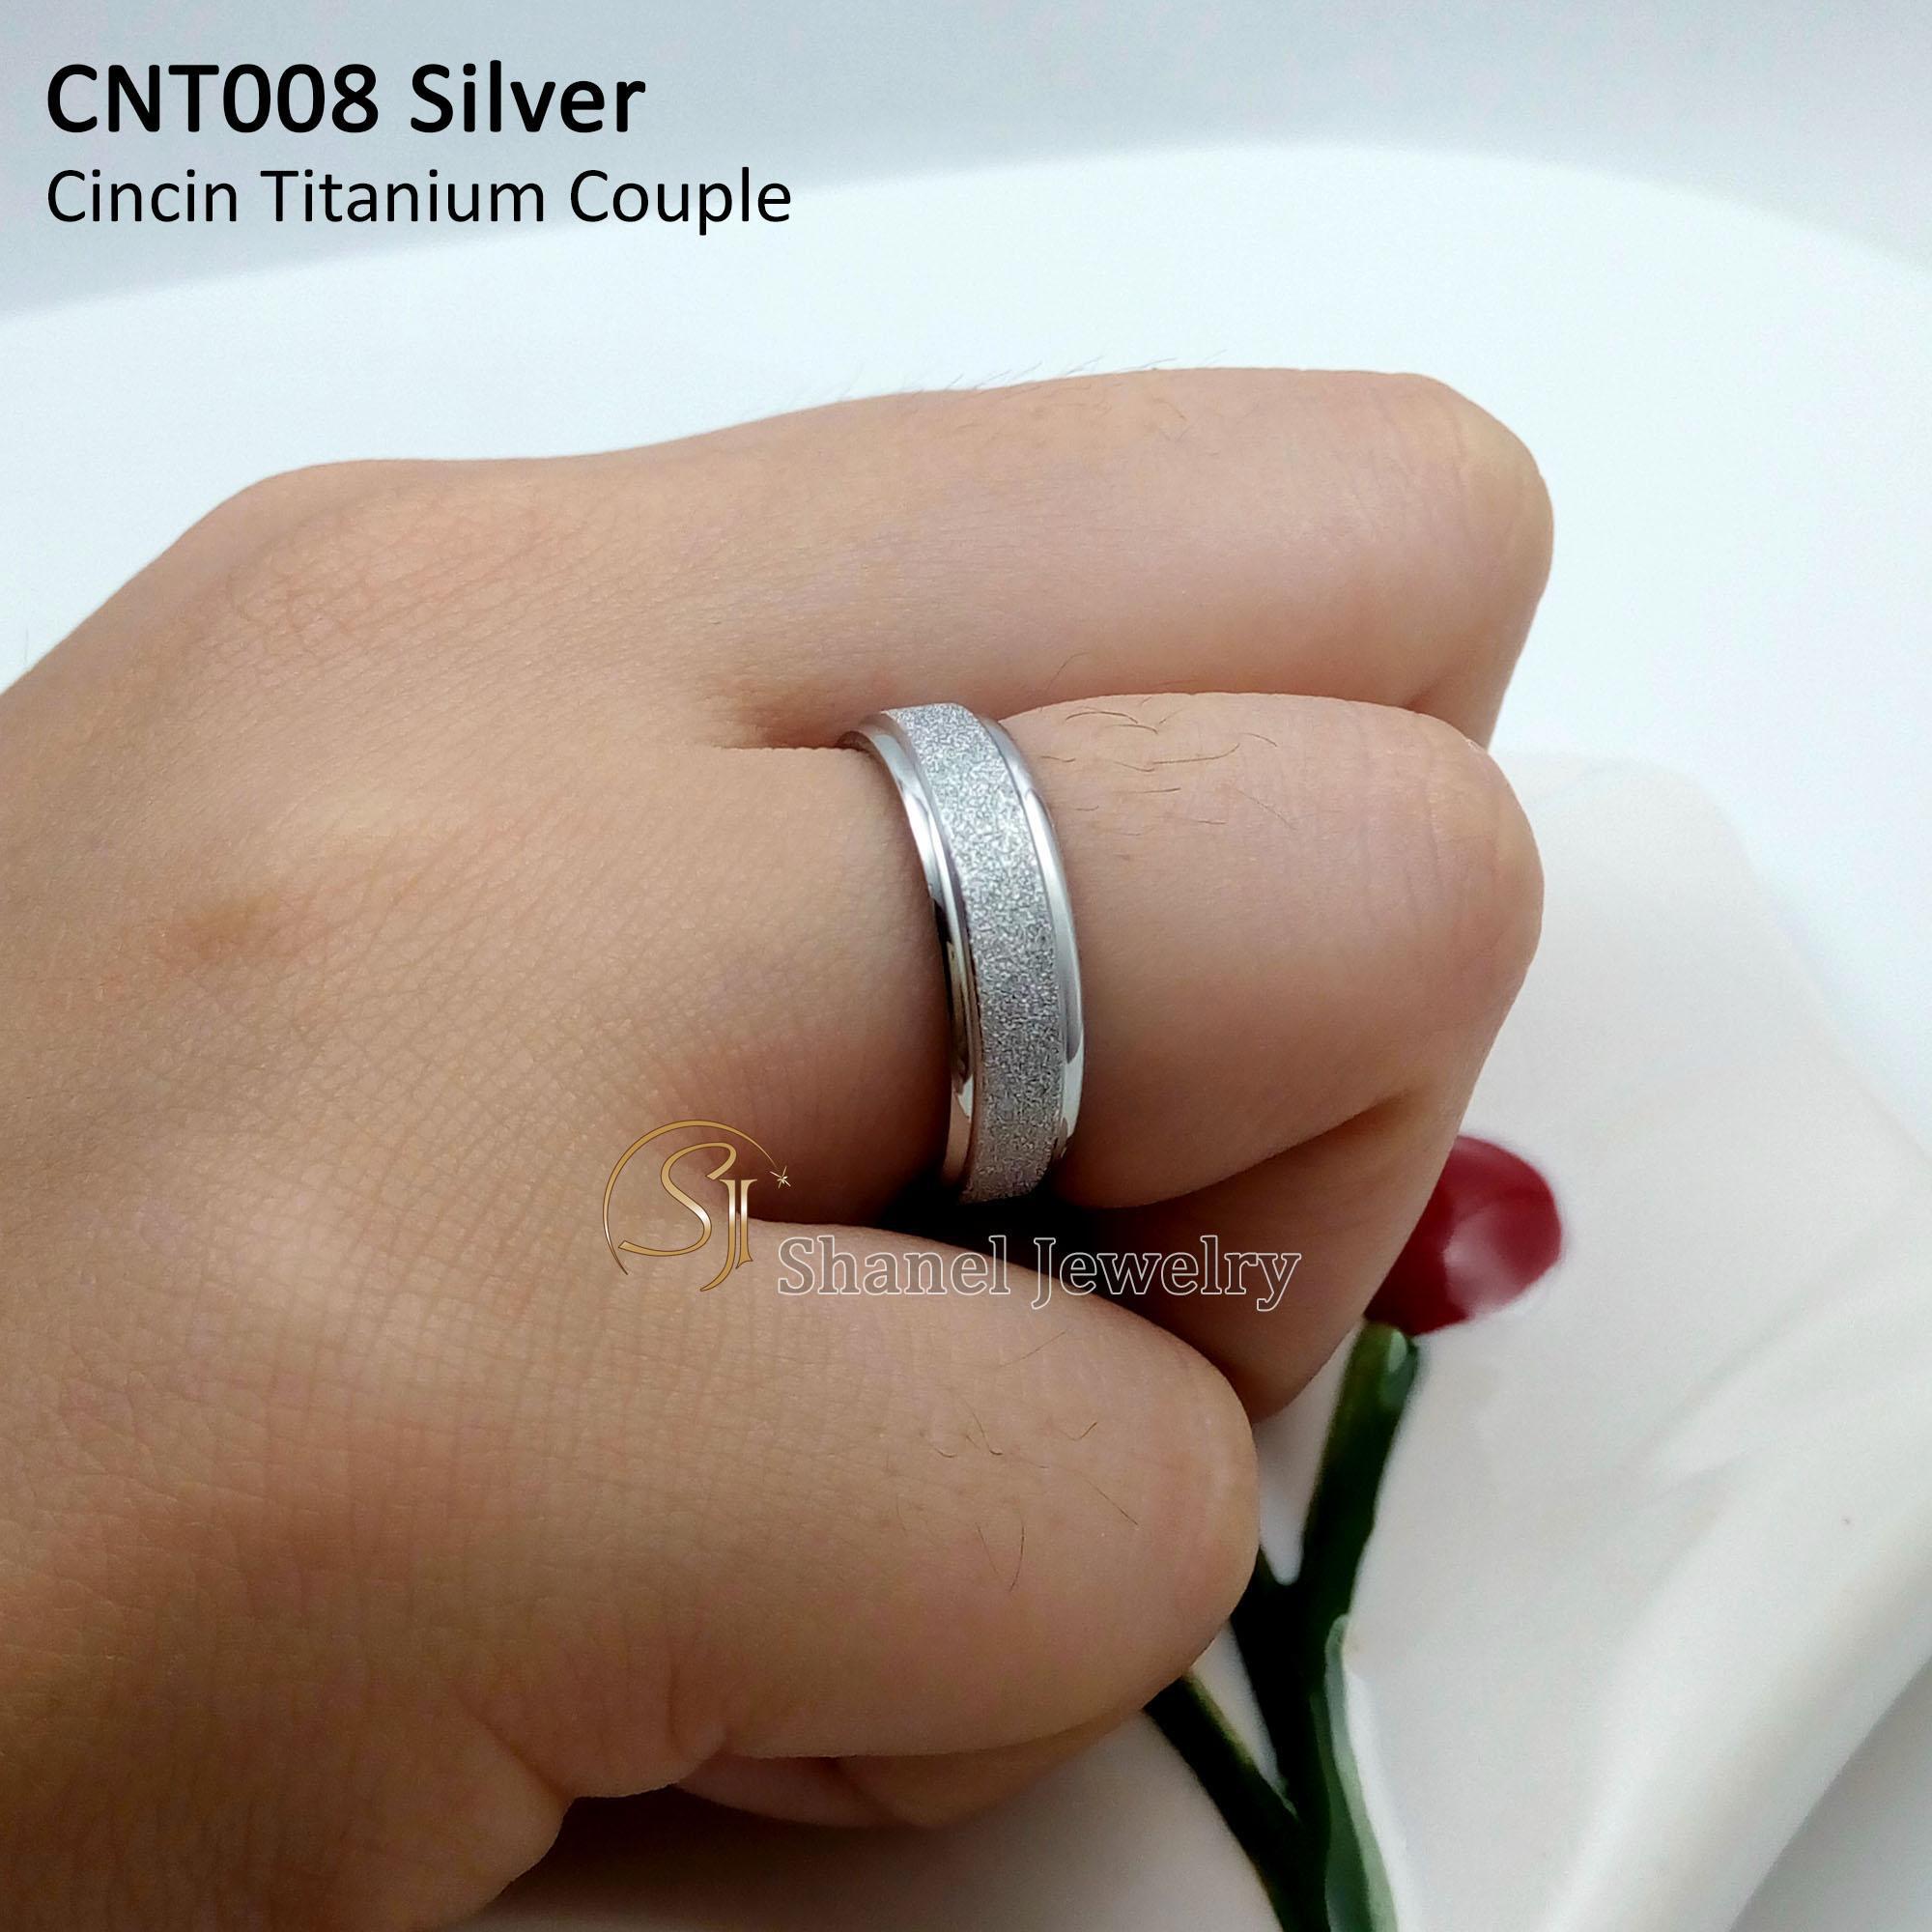 SJ Cincin Kawin Couple Pasangan Pacaran untuk Pria Wanita bahan Titanium Awet Anti karat anti alergi perhiasan fashion premium Quality CNT008